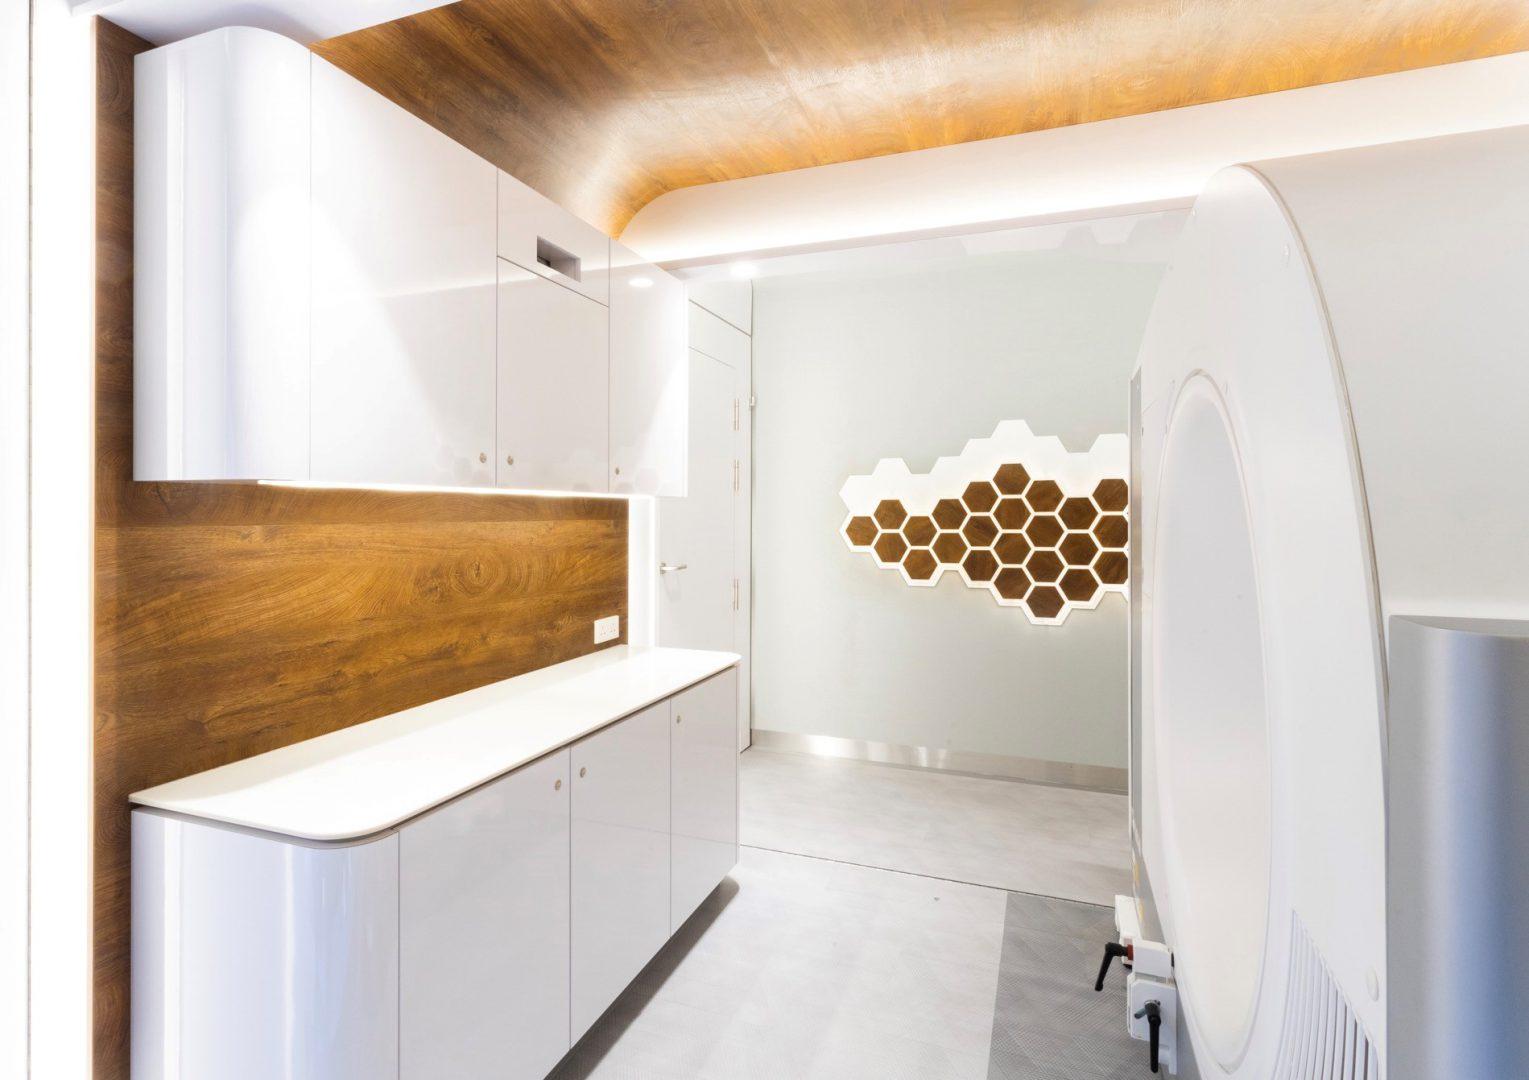 Mobiele-CT-scan-unit-cleanroom-zorg-interieur-container-ZIJLSTRA-SCHIPPER-architecten-architectenbureau-noord-holland-architect-002